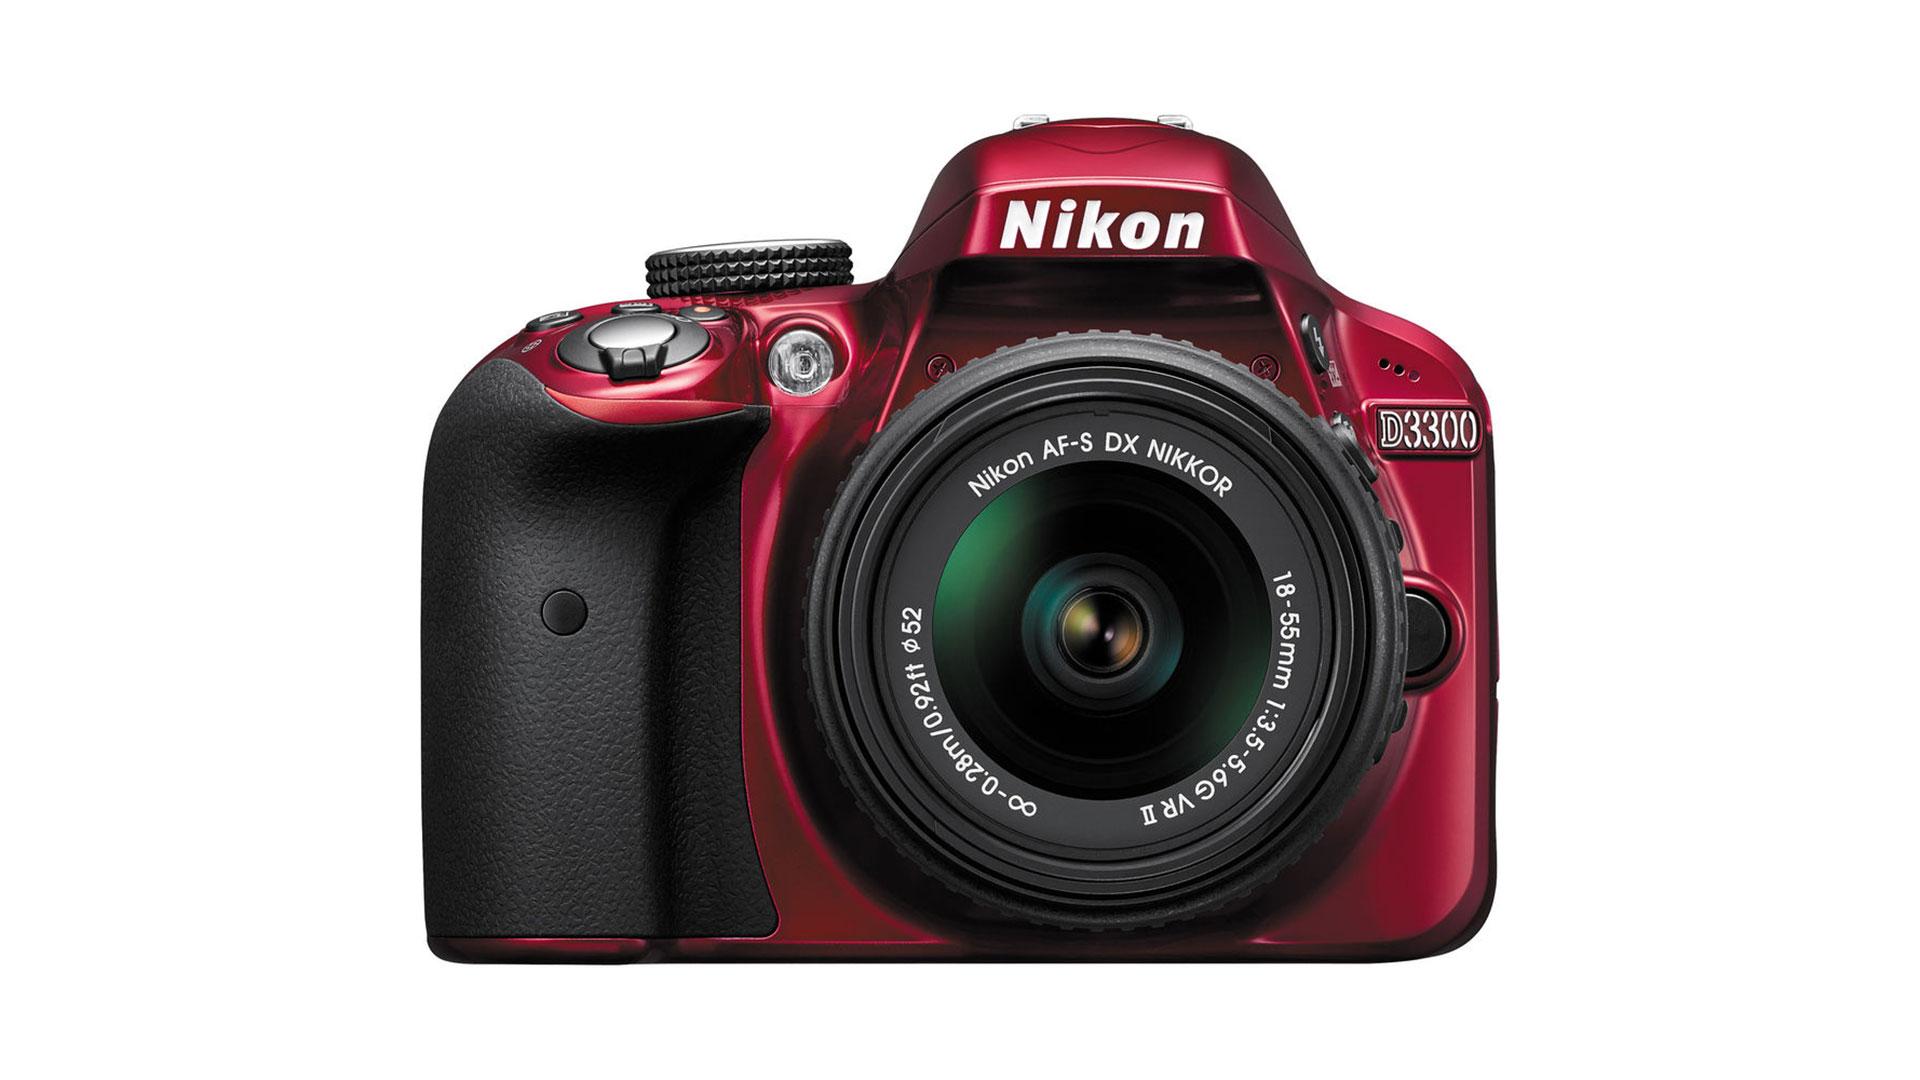 Camera Dslr Small Camera best cameras for vacation bh explora